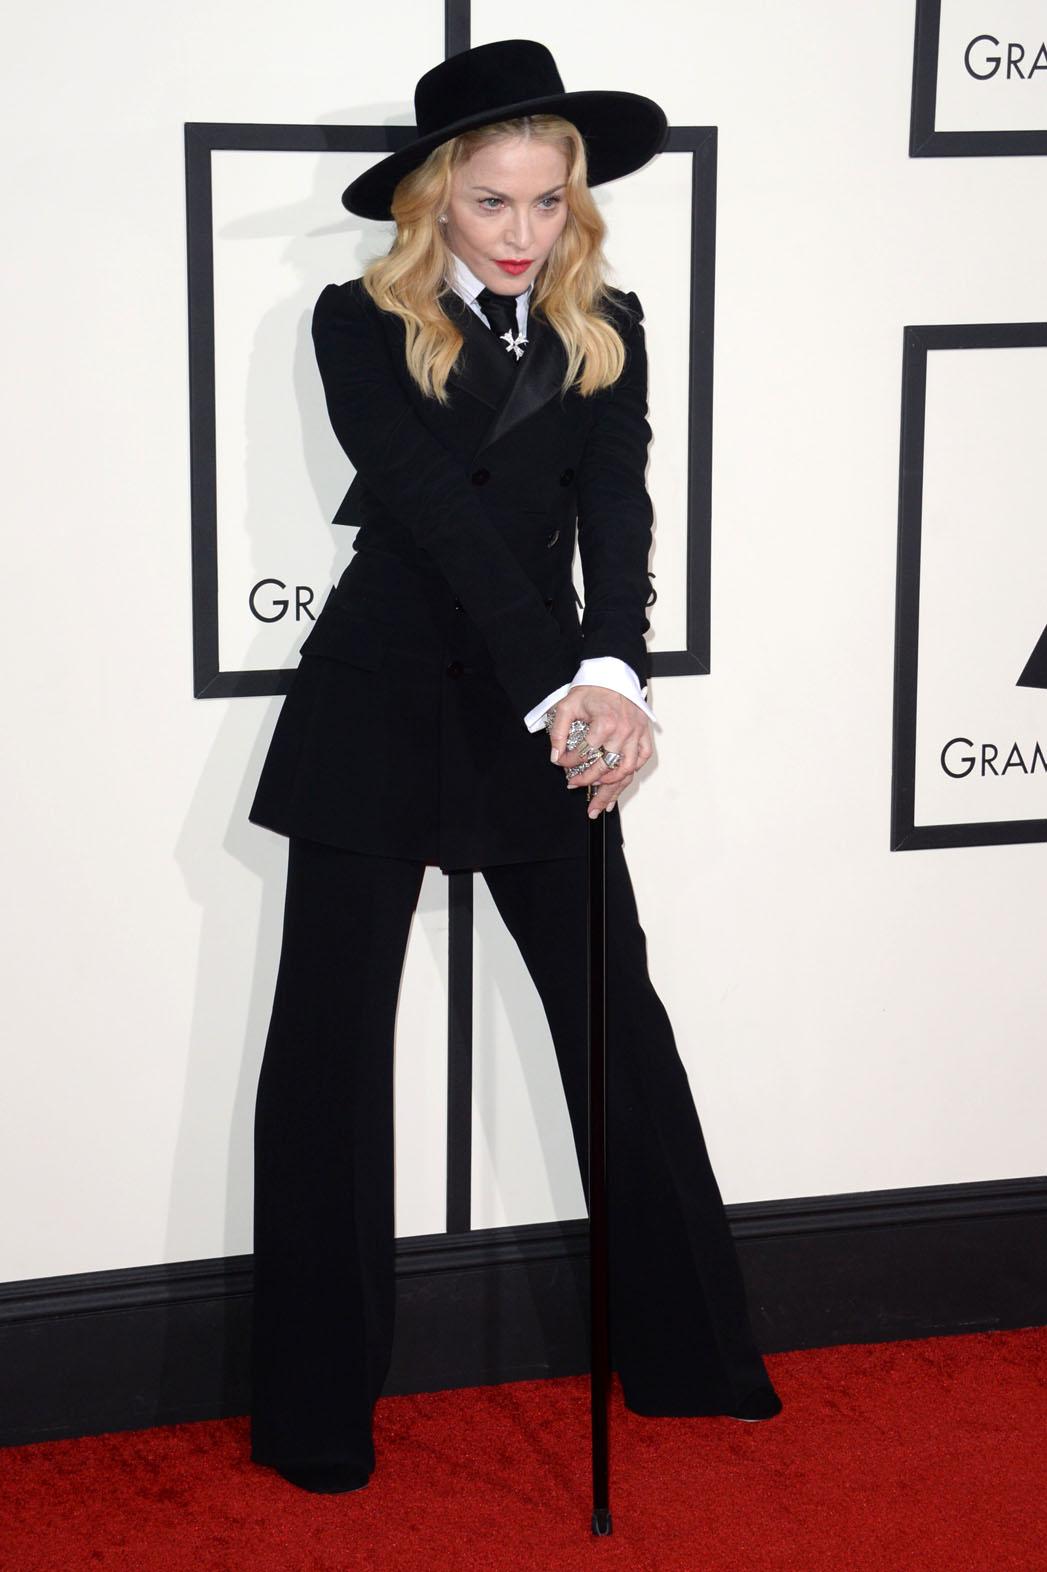 Madonna Suit Grammy Awards - P 2014